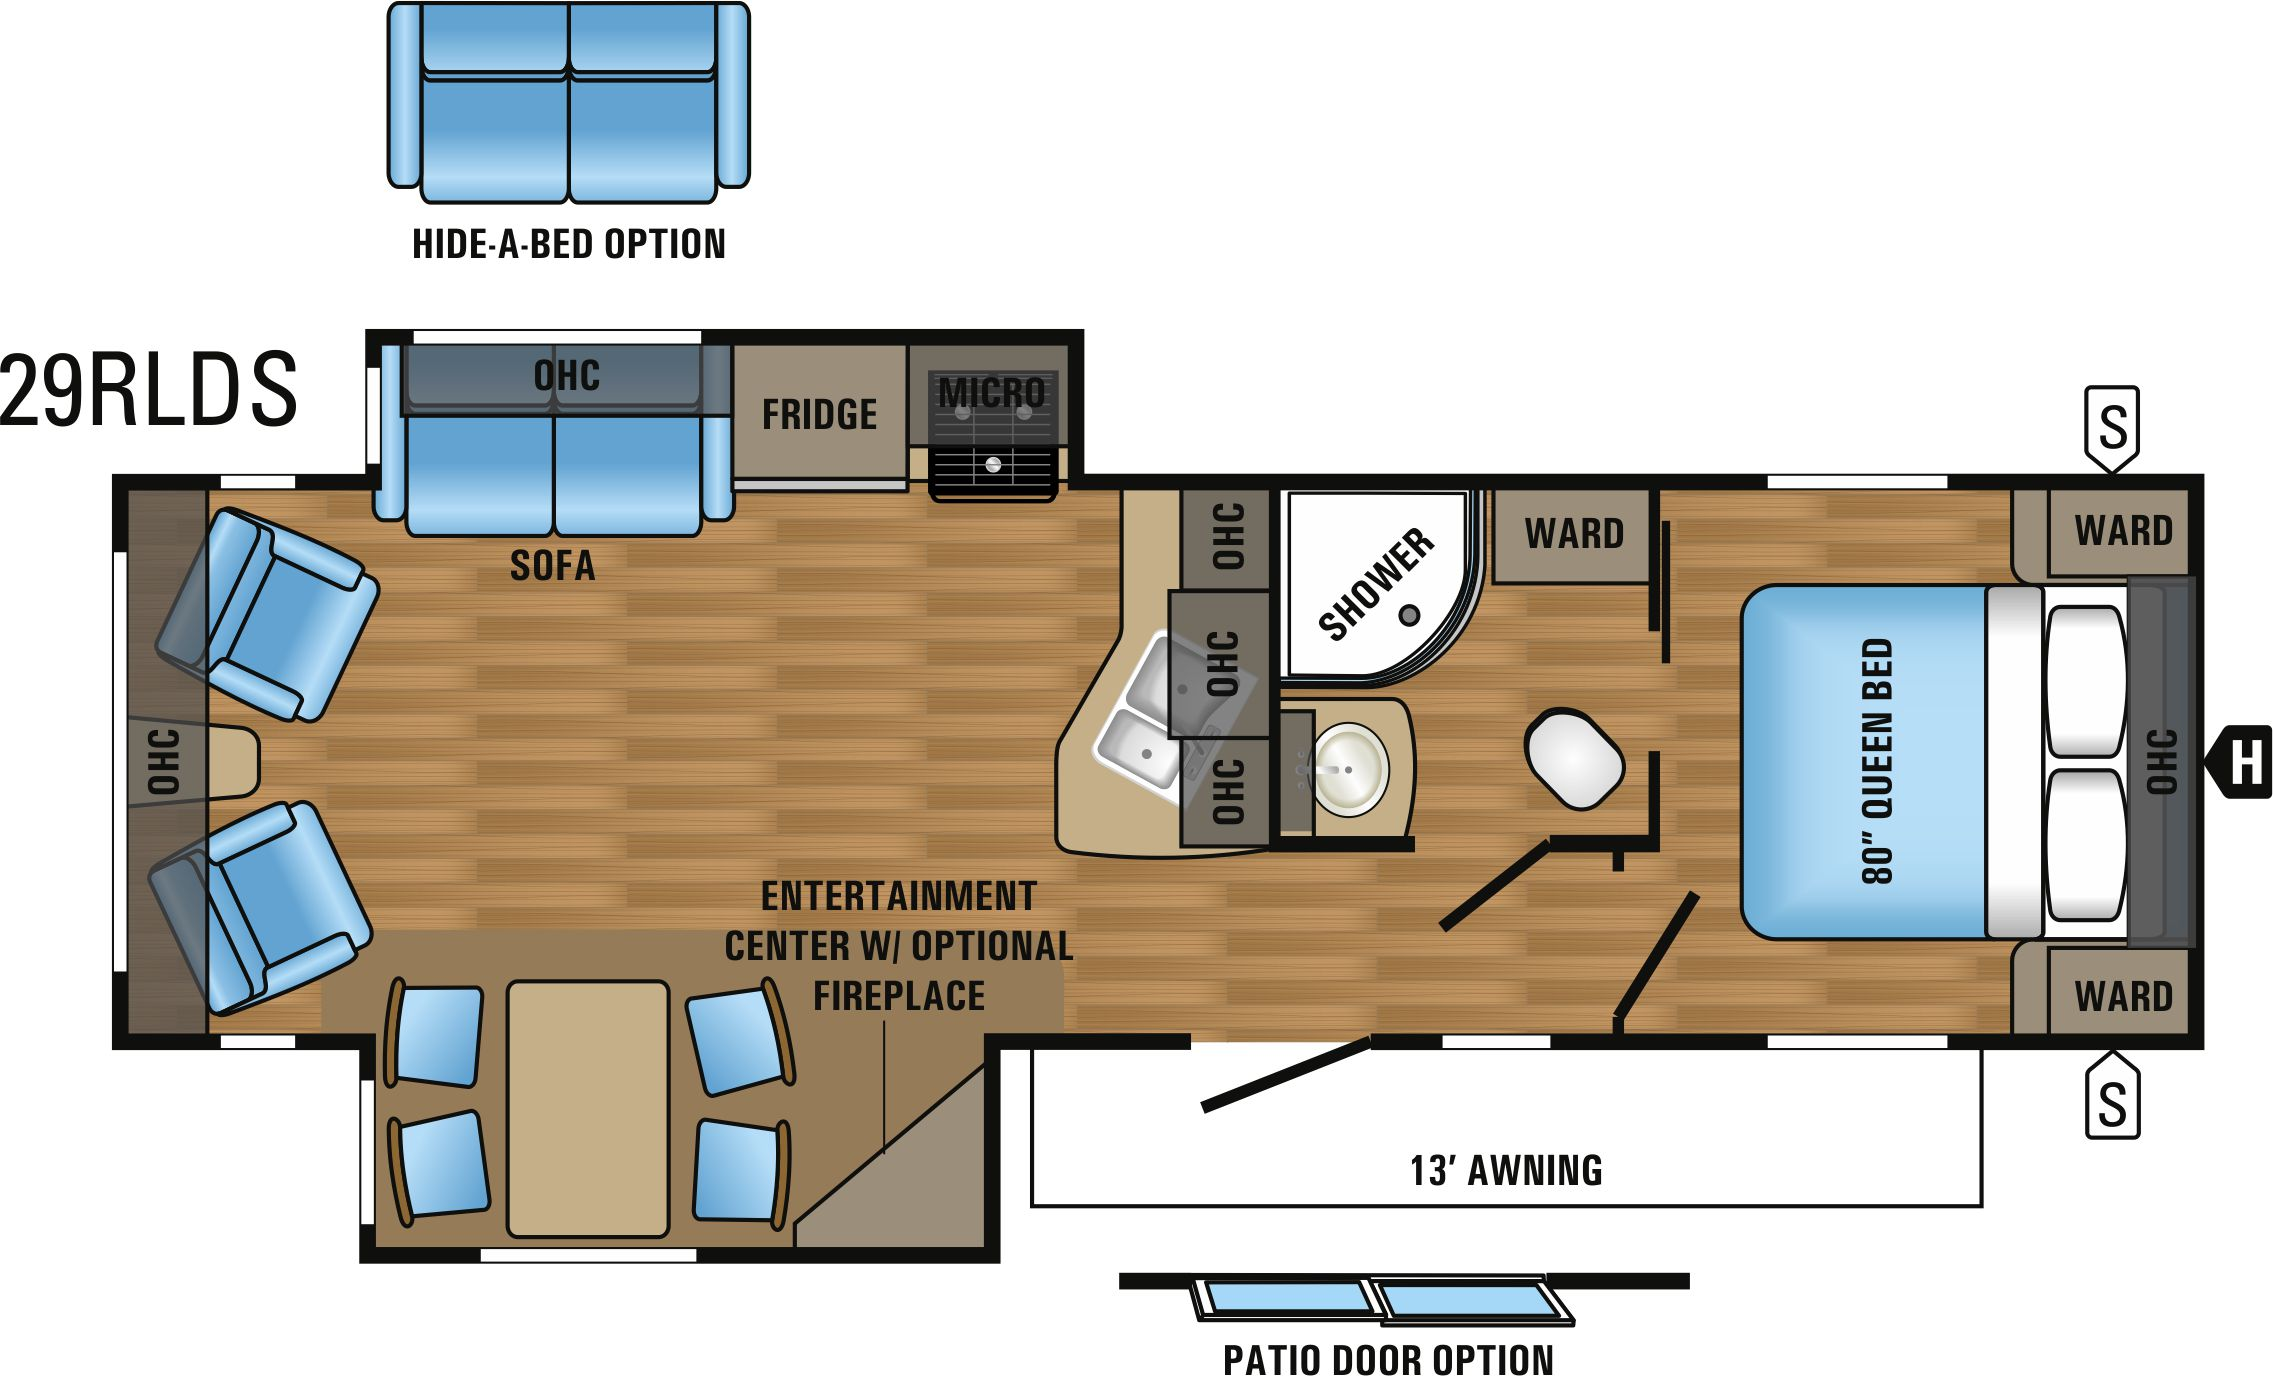 29RLDS Floorplan